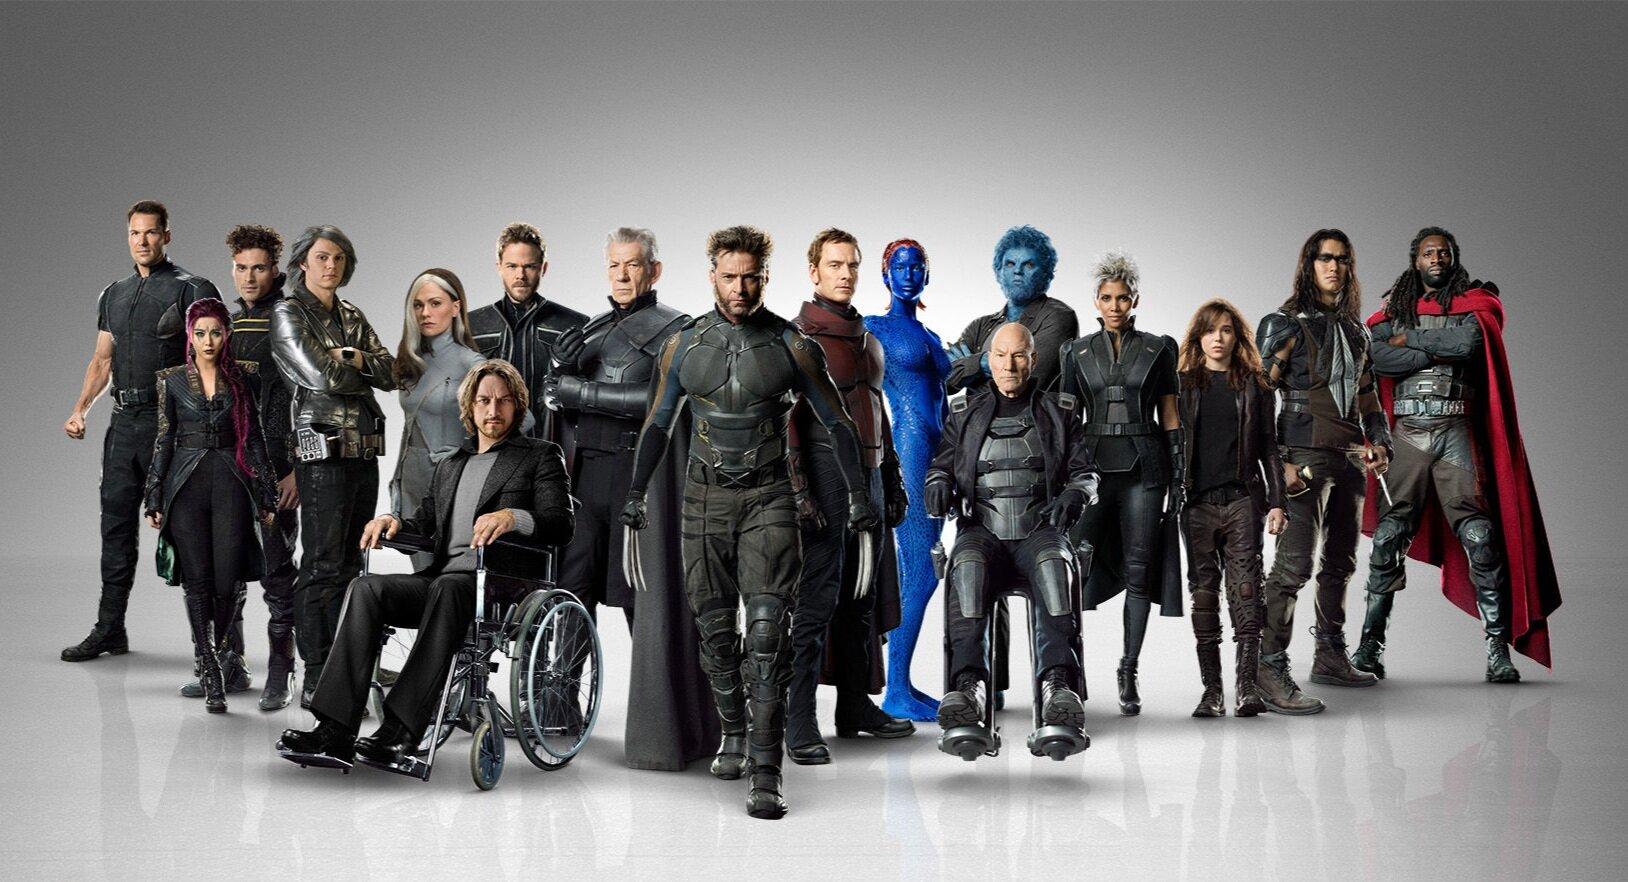 X-Men-Days-of-Future-Past-Full-Cast-Promo-Photo.jpg